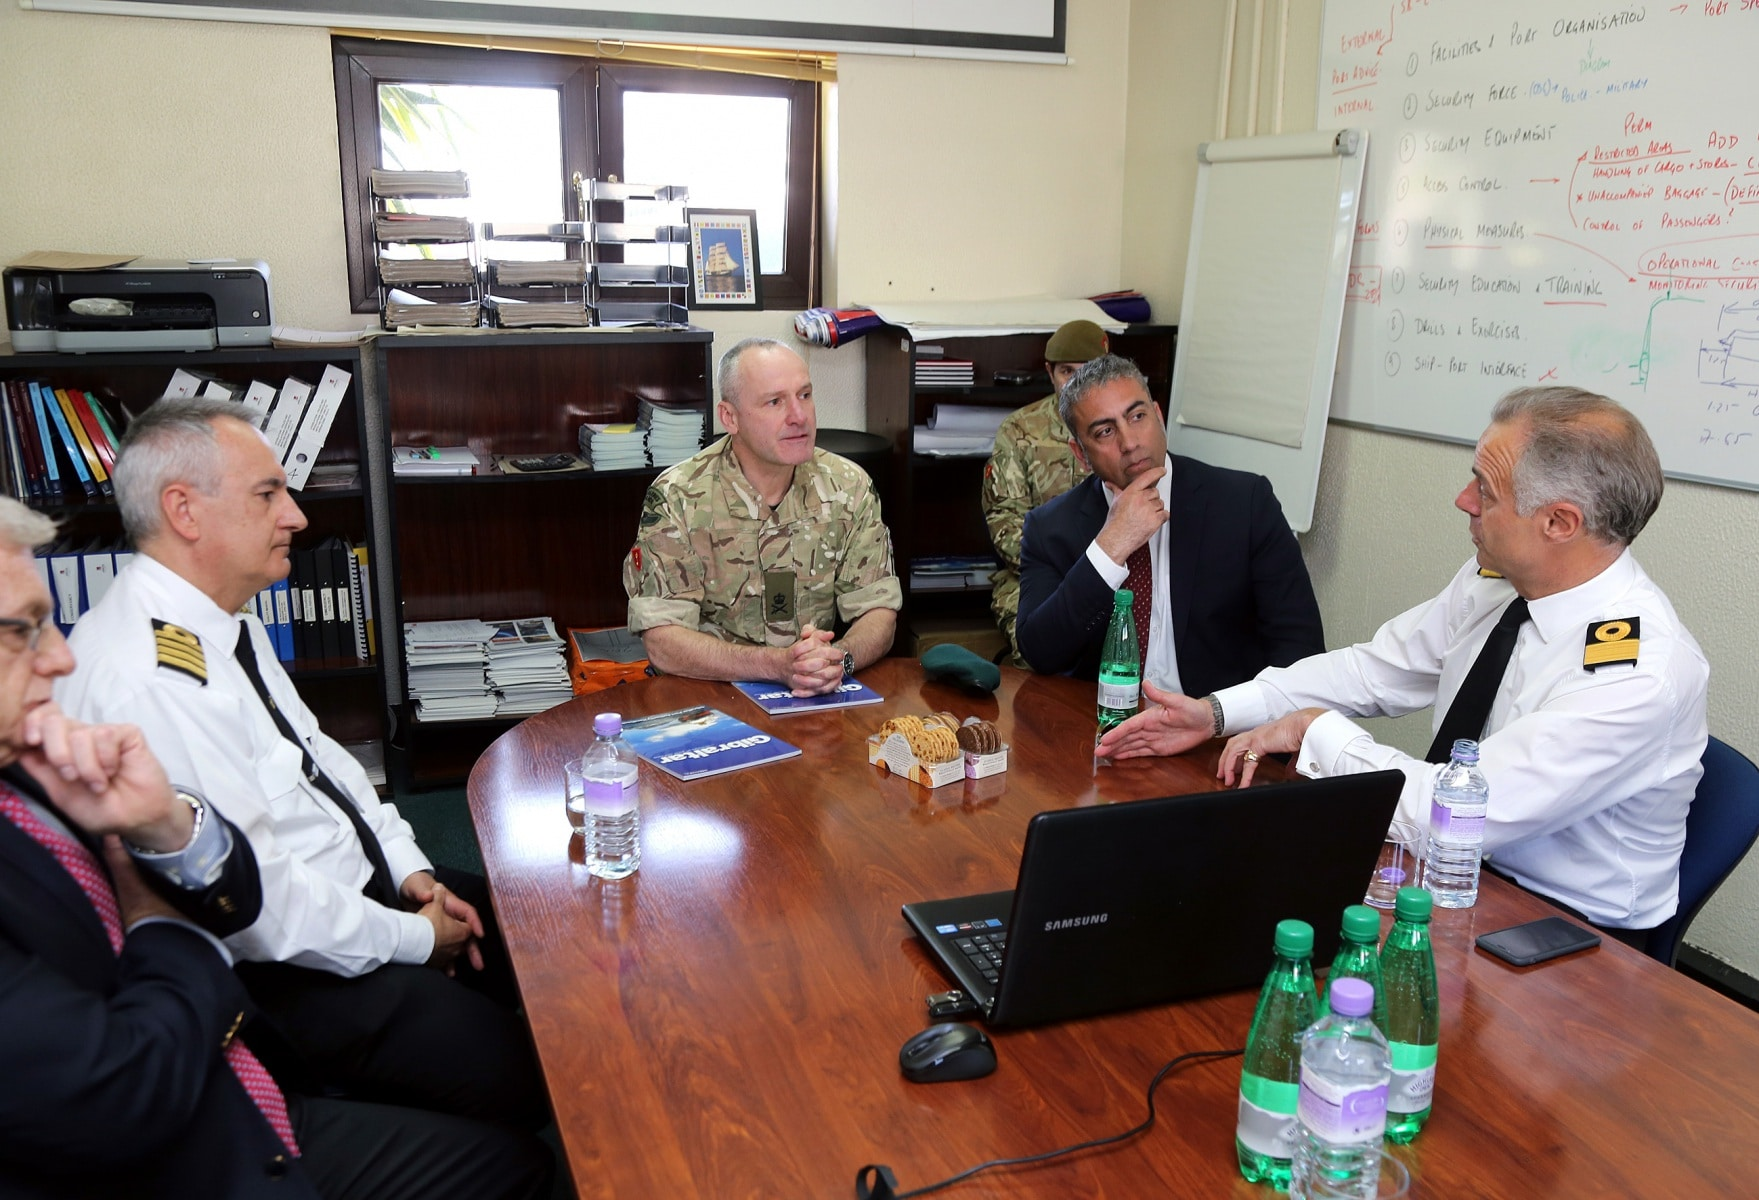 visita-oficial-del-gobernador-al-puerto-de-gibraltar_25551863733_o